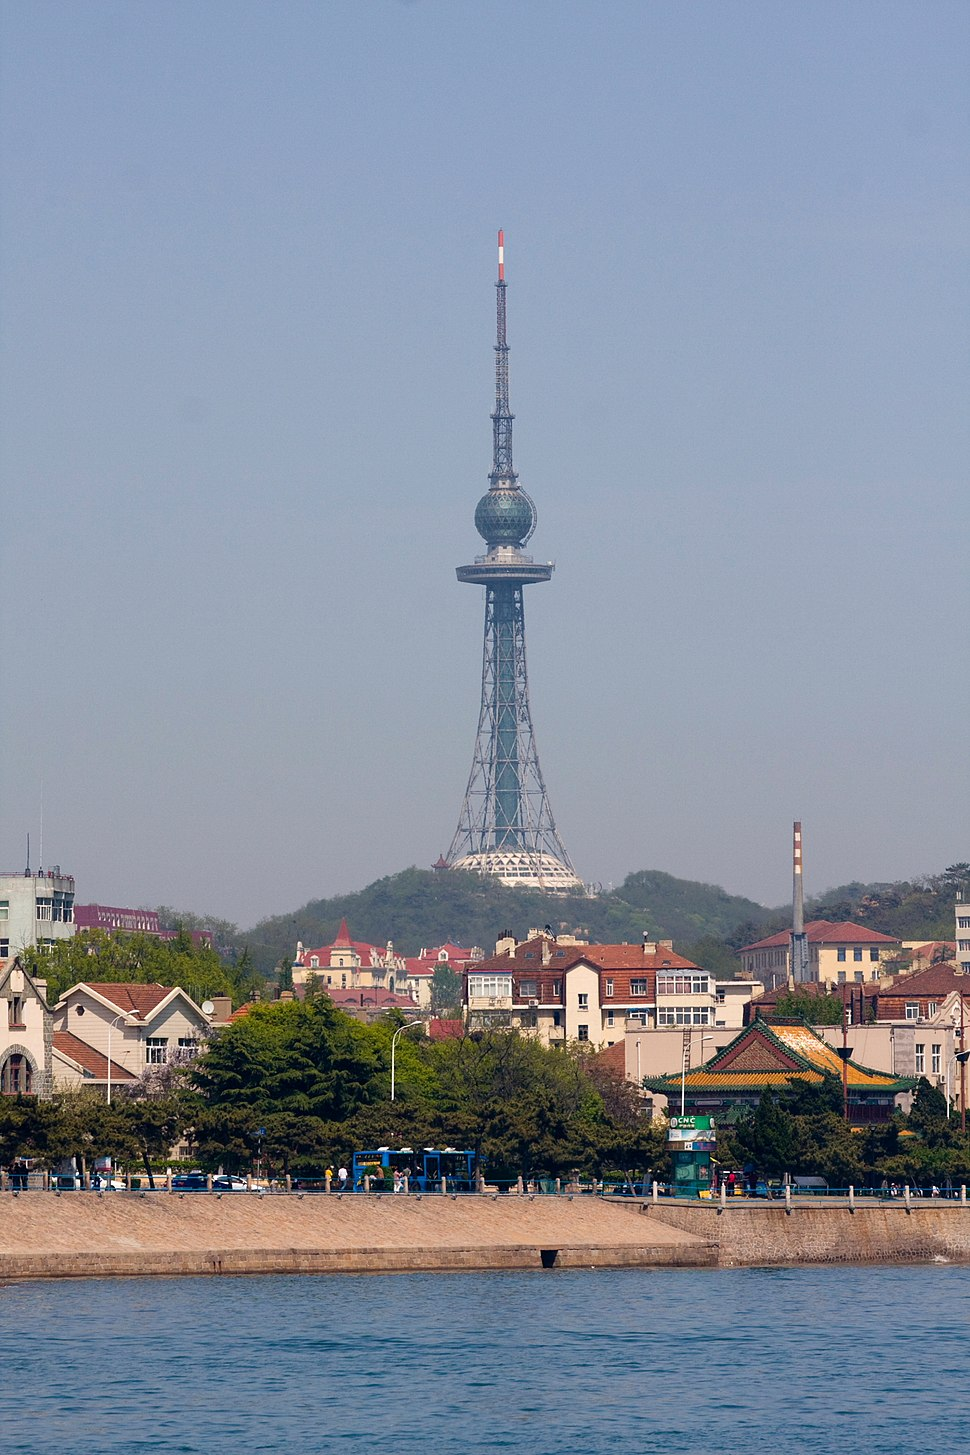 Views of Qingdao tower